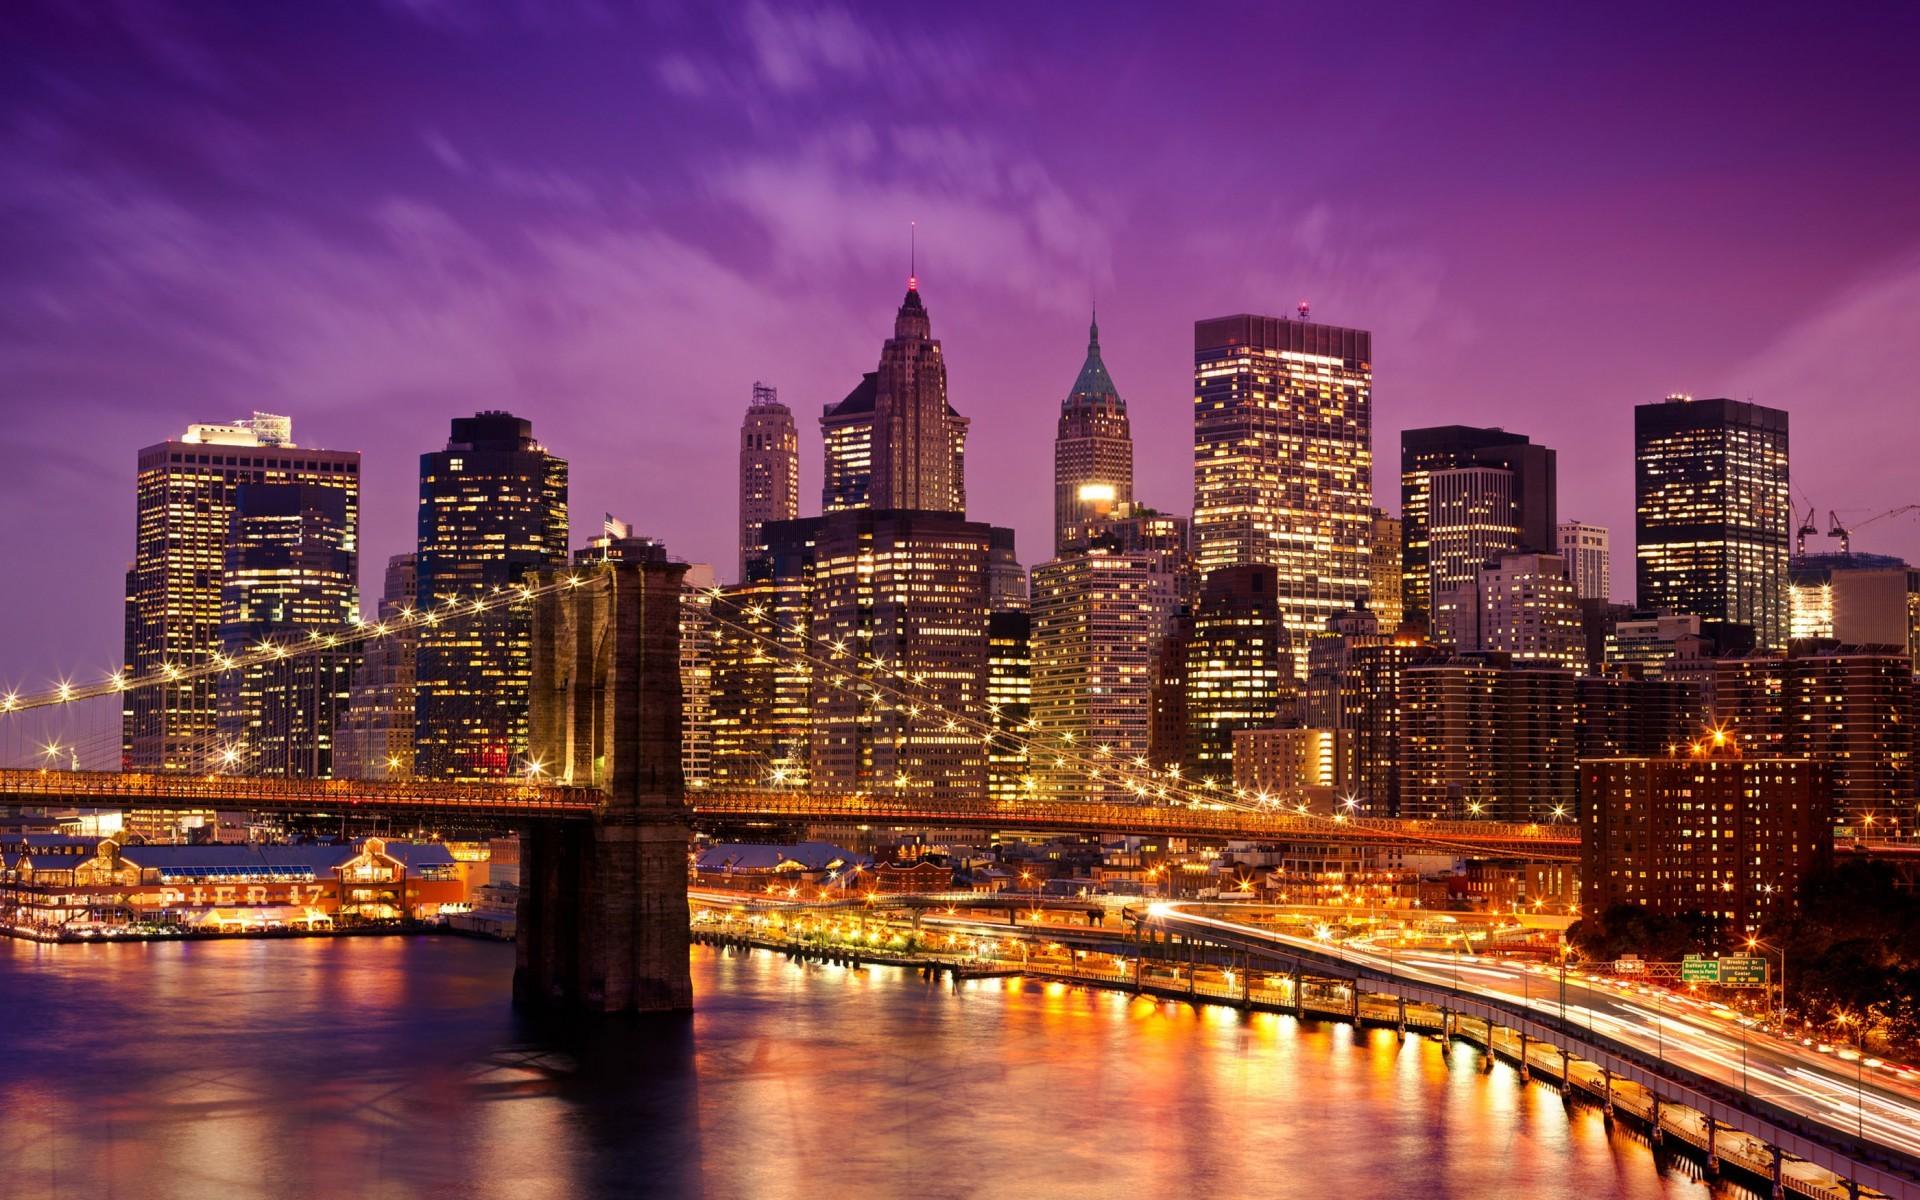 New York City Desktop Wallpaper 67 Images